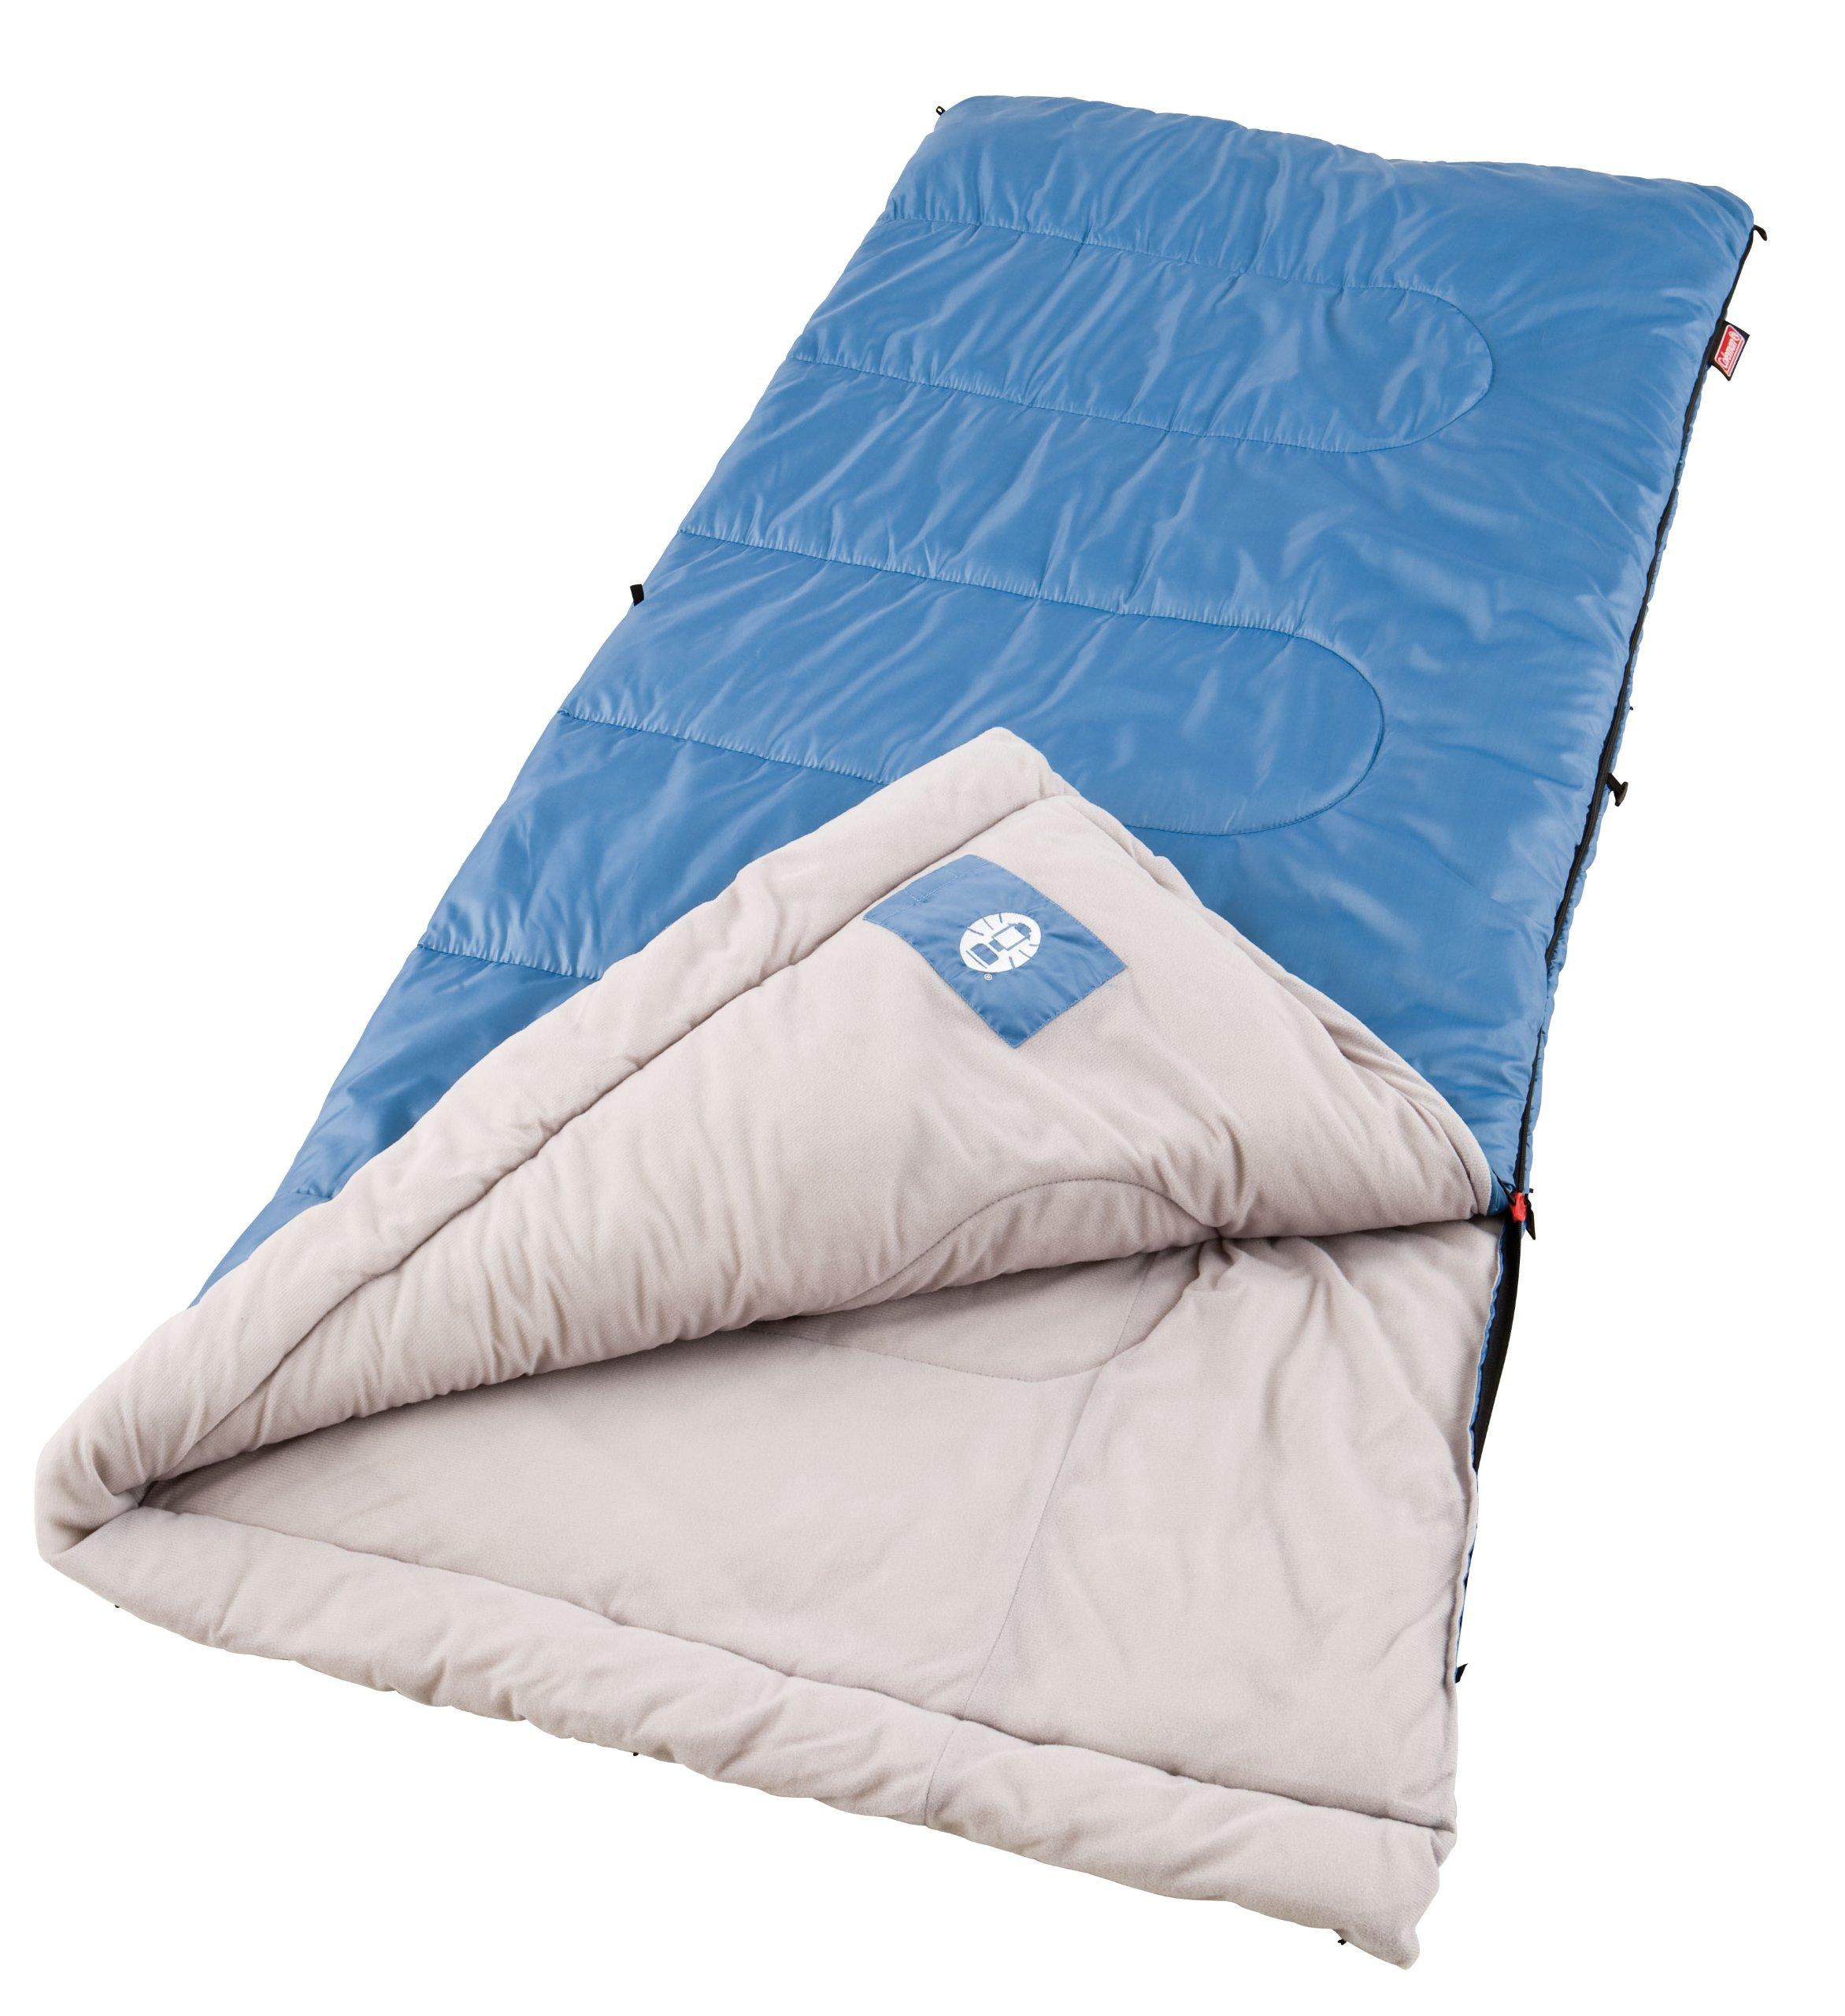 Coleman Sunridge 40 60 Degree Sleeping Bag